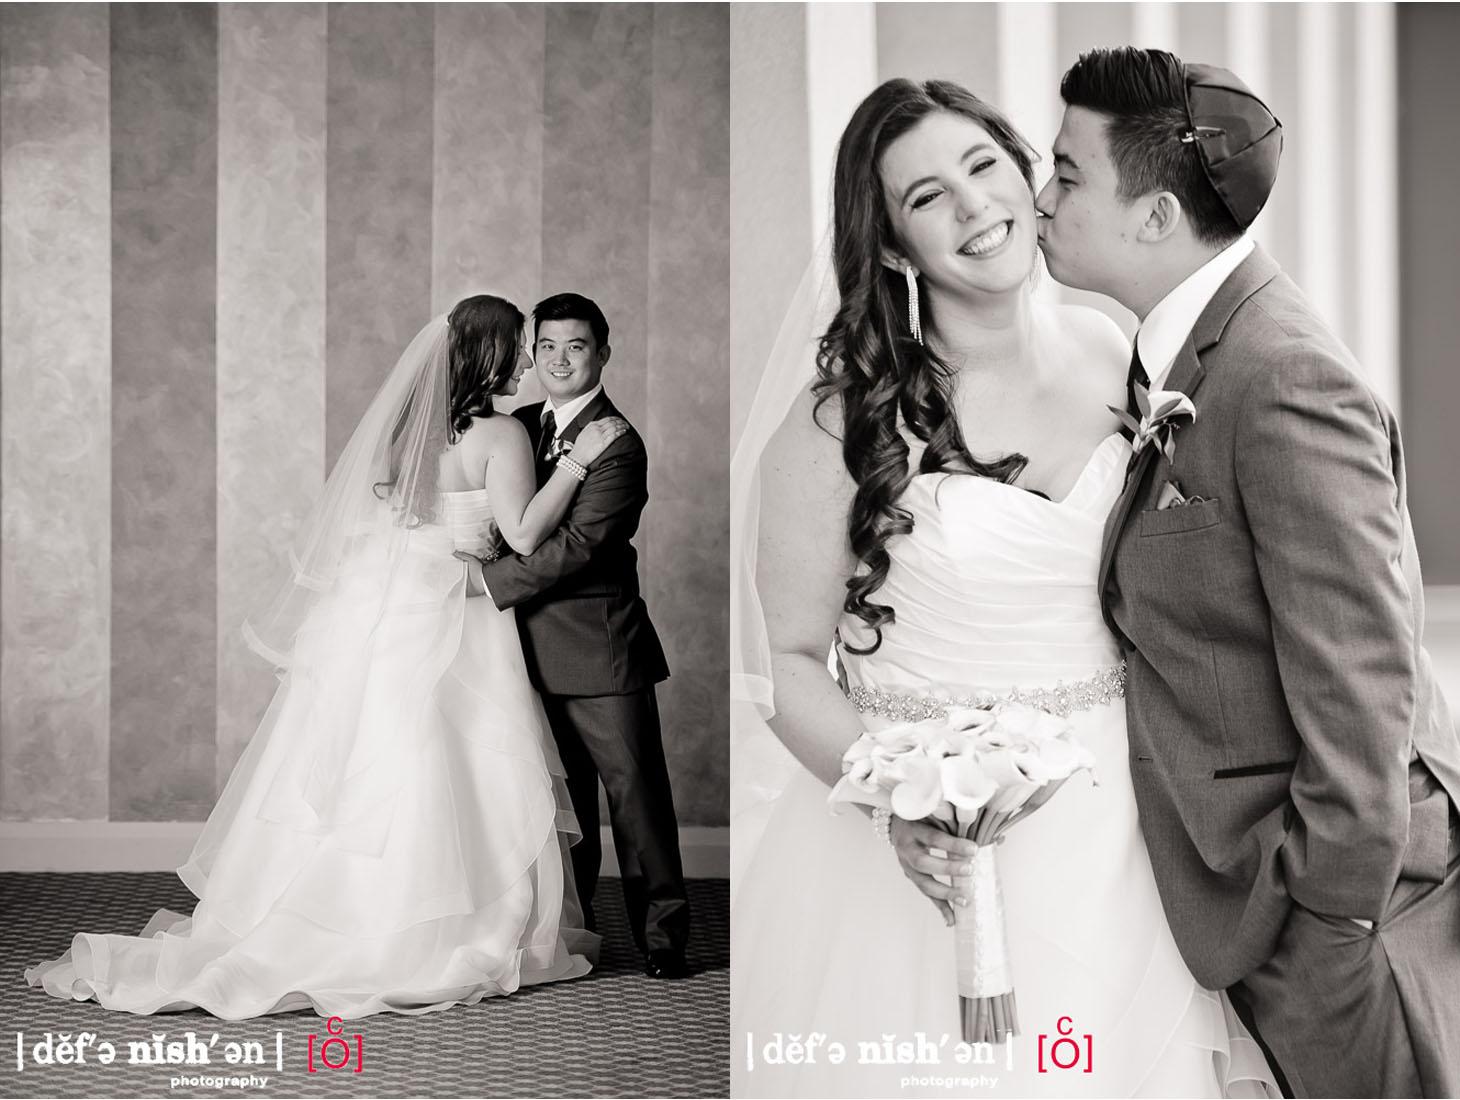 Definition Photography - Beth Emmeth Wedding - Toronto Ontario(15).jpg